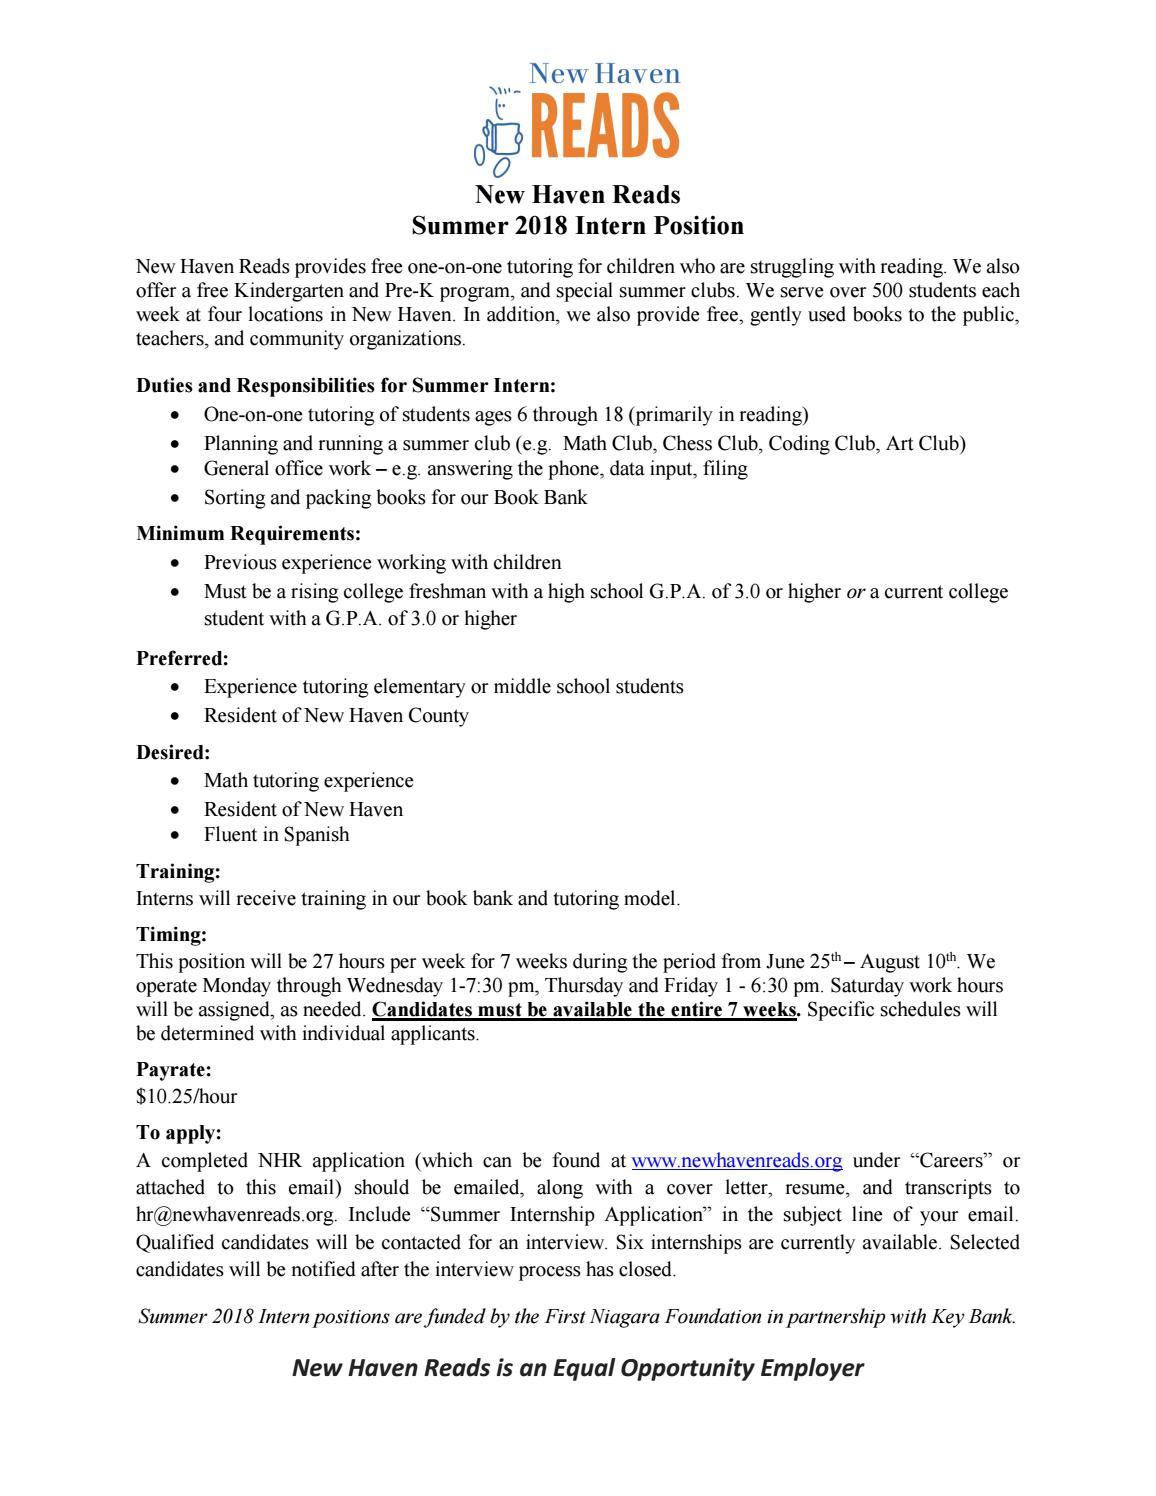 2018-key-bank-summer-internship by New Haven Reads - issuu